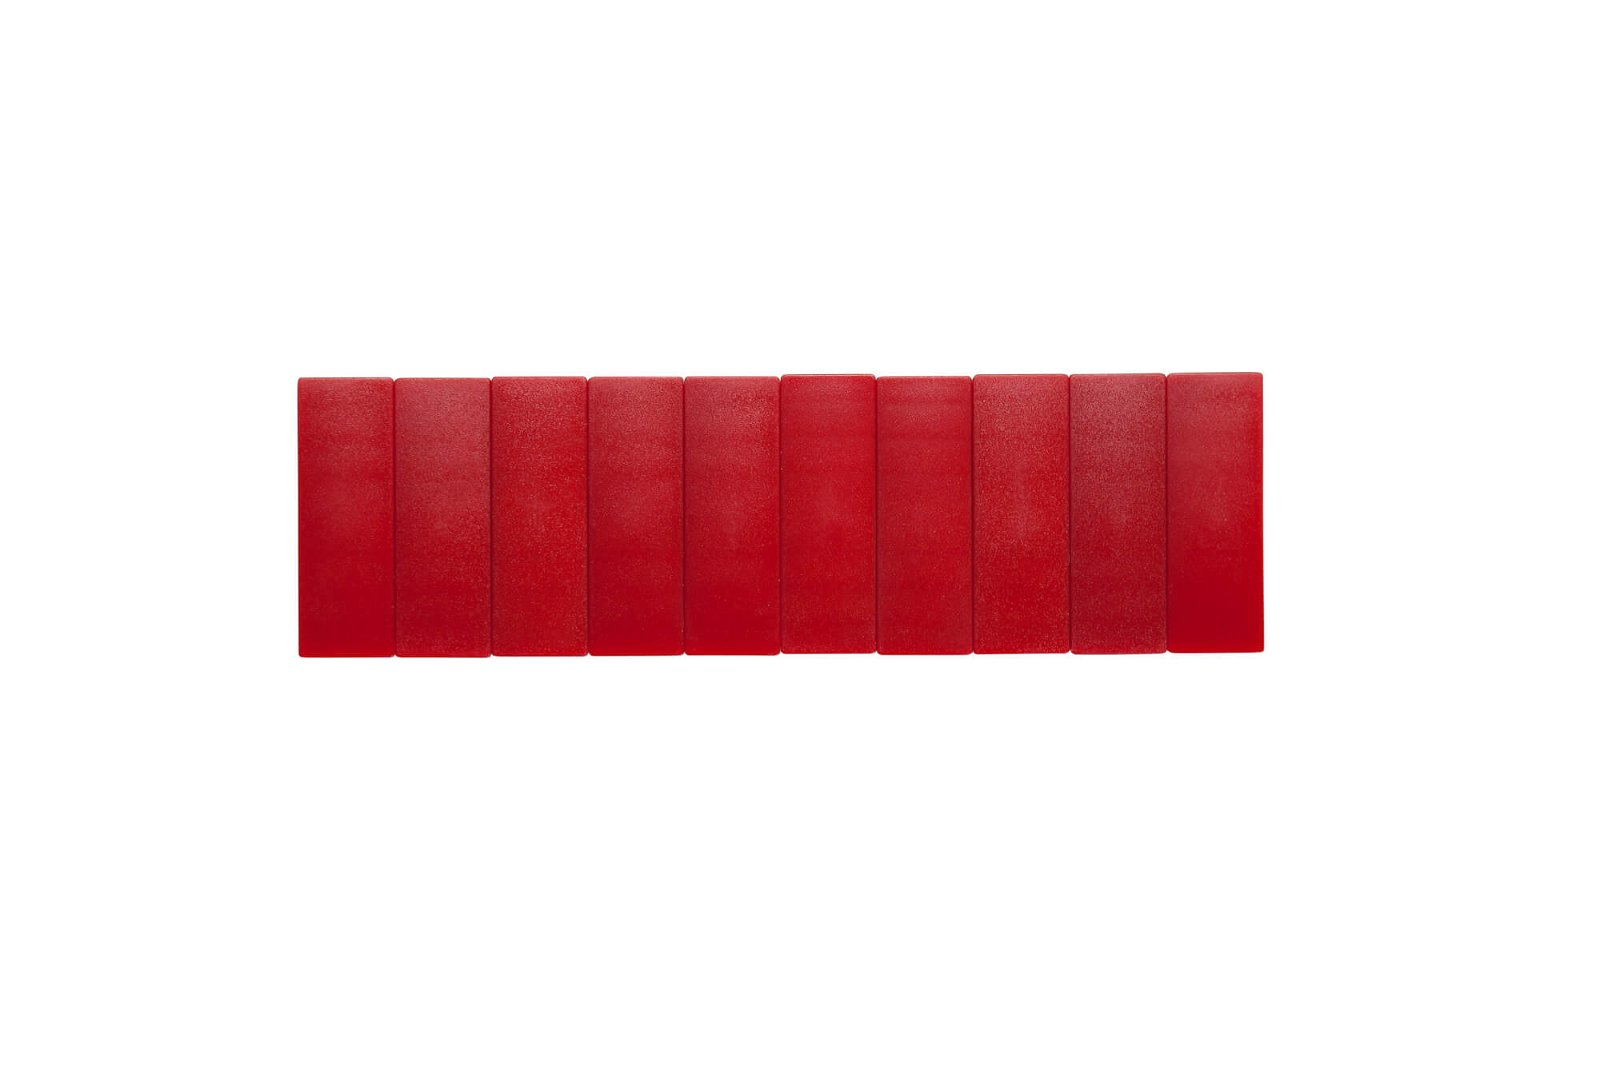 Magnet MAULsolid 54 x 19 mm, 1 kg Haftkraft, 10 St./Ktn., rot